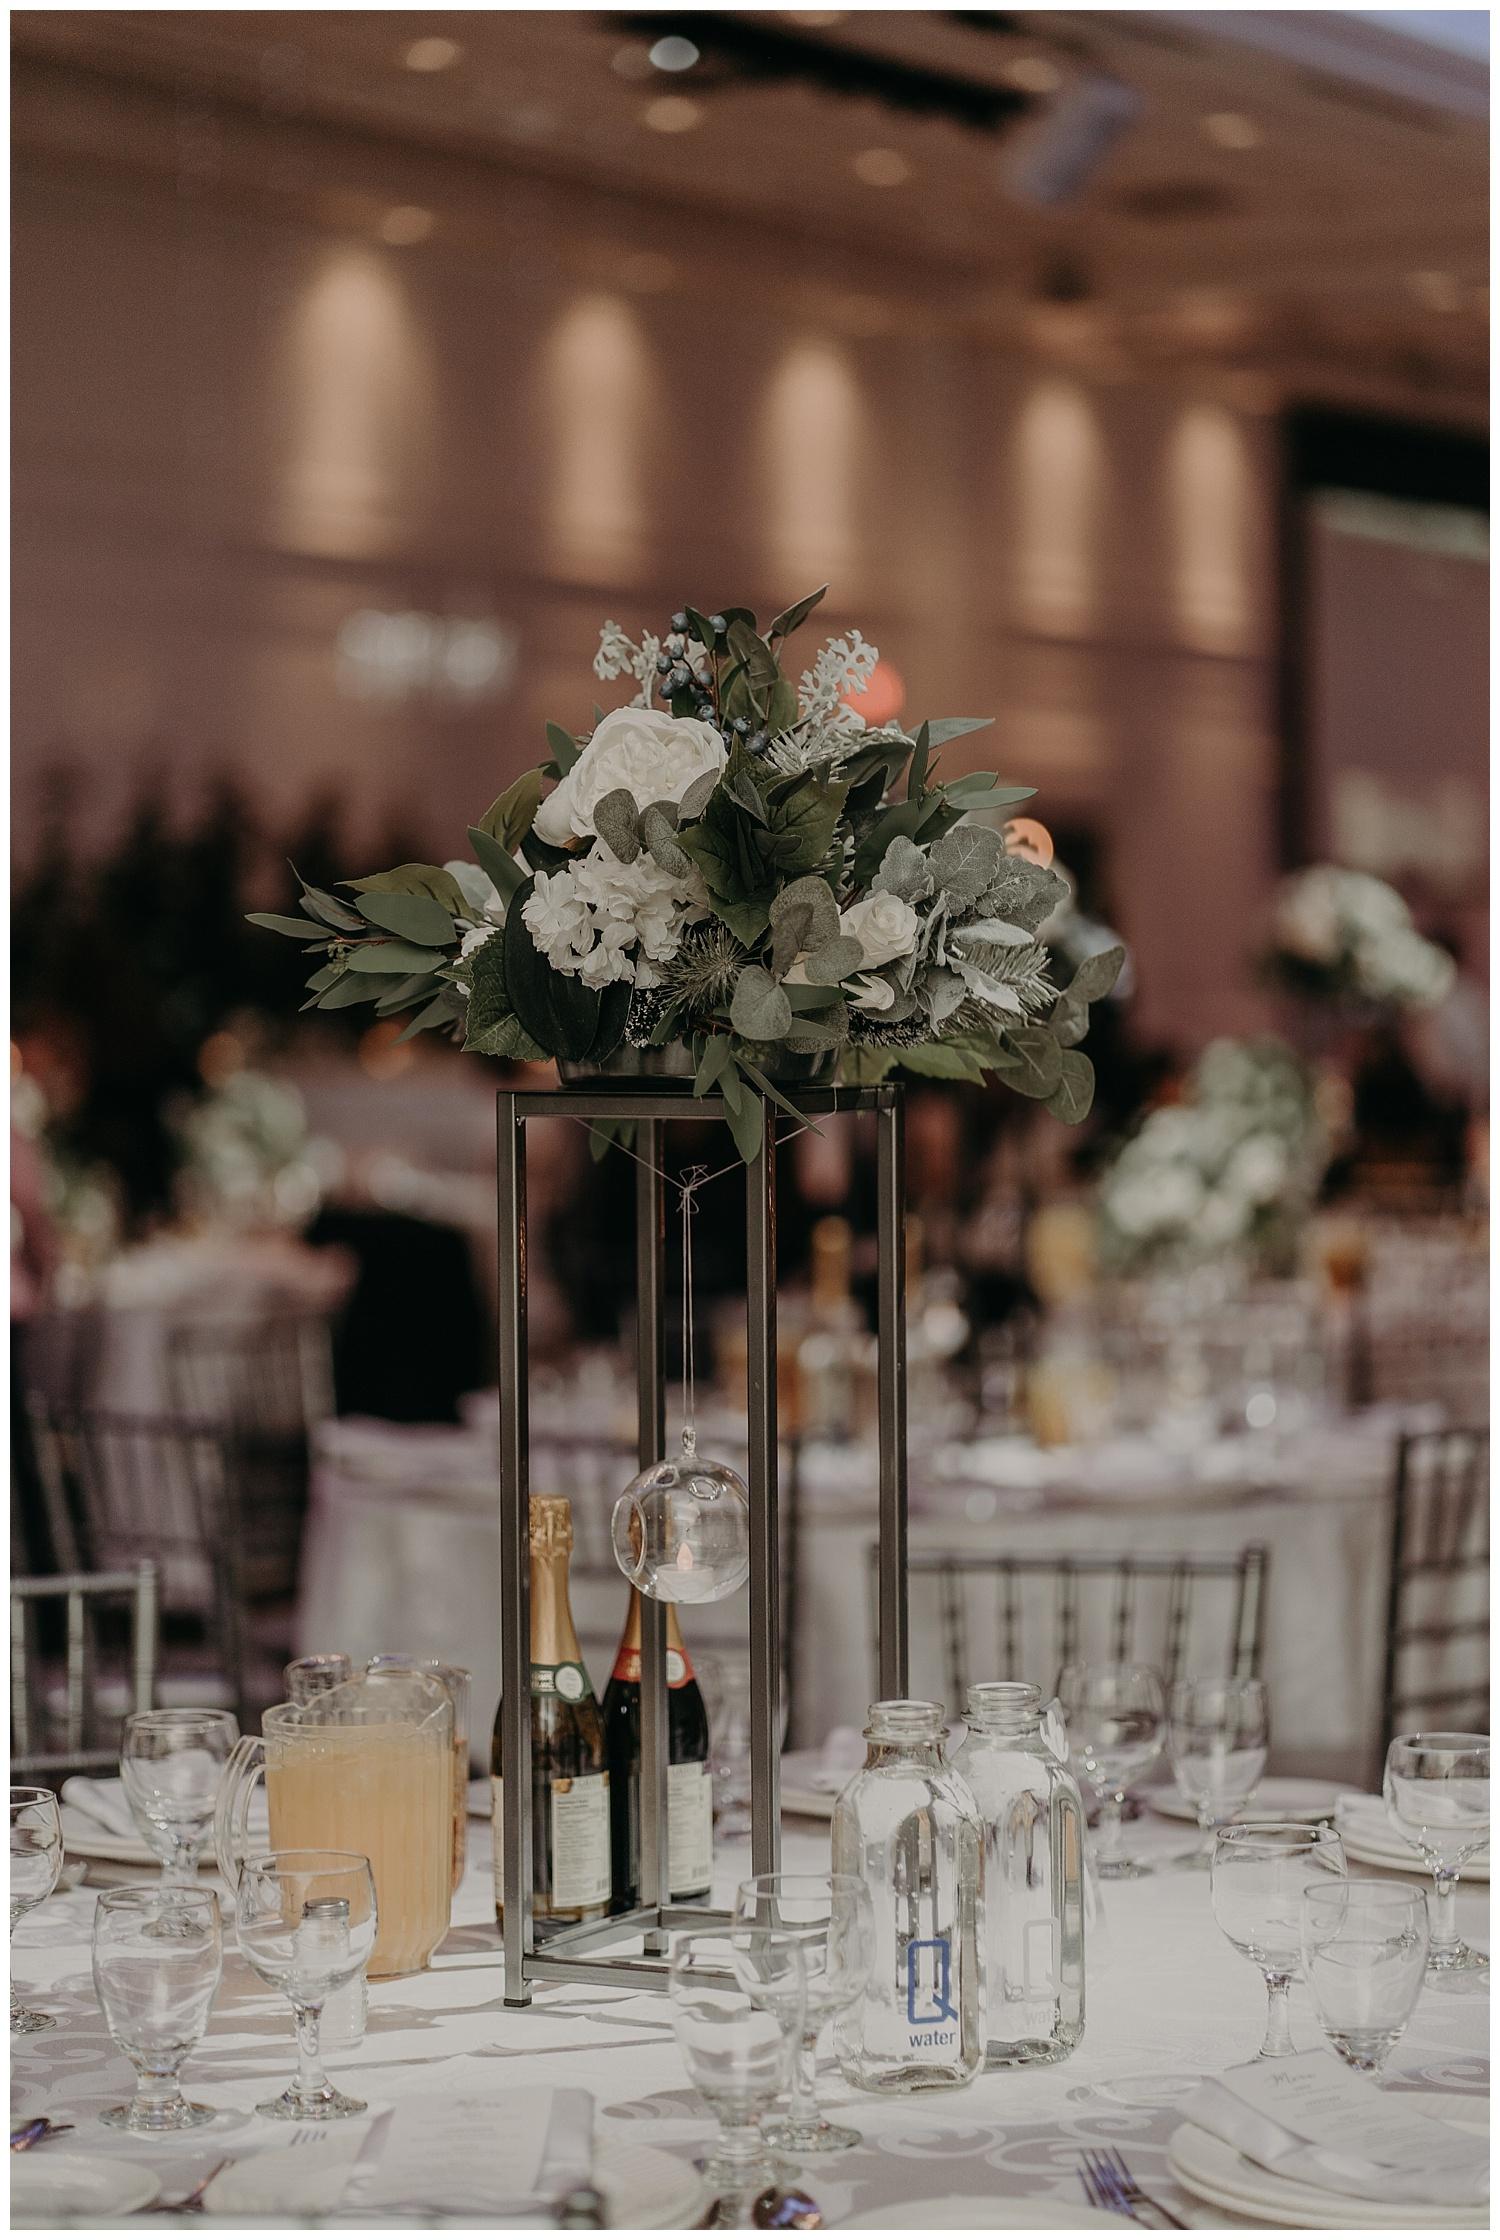 Katie Marie Photography | Hamilton Ontario Wedding Photographer | Ancaster Mill Winter Wedding | Oakville Conference Centre Wedding | RBG Wedding | Royal Botanical Gardens Wedding_0241.jpg